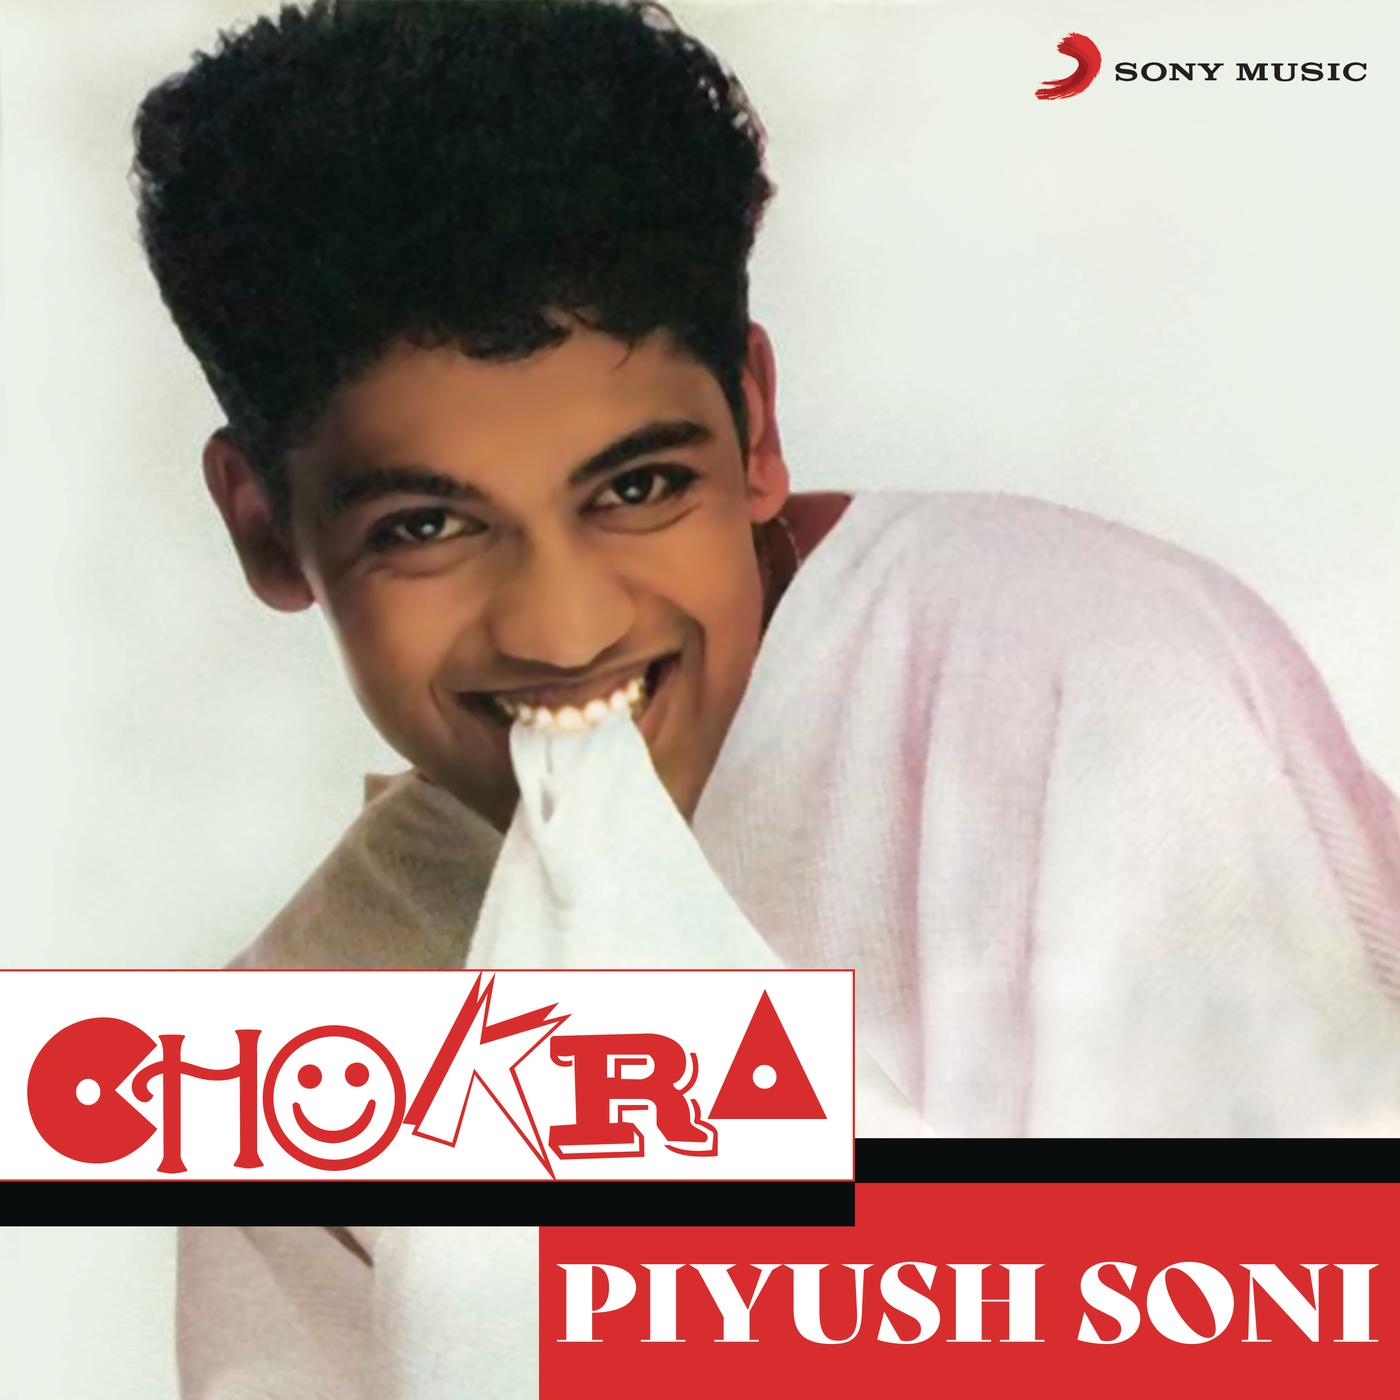 Chokra - Piyush Soni